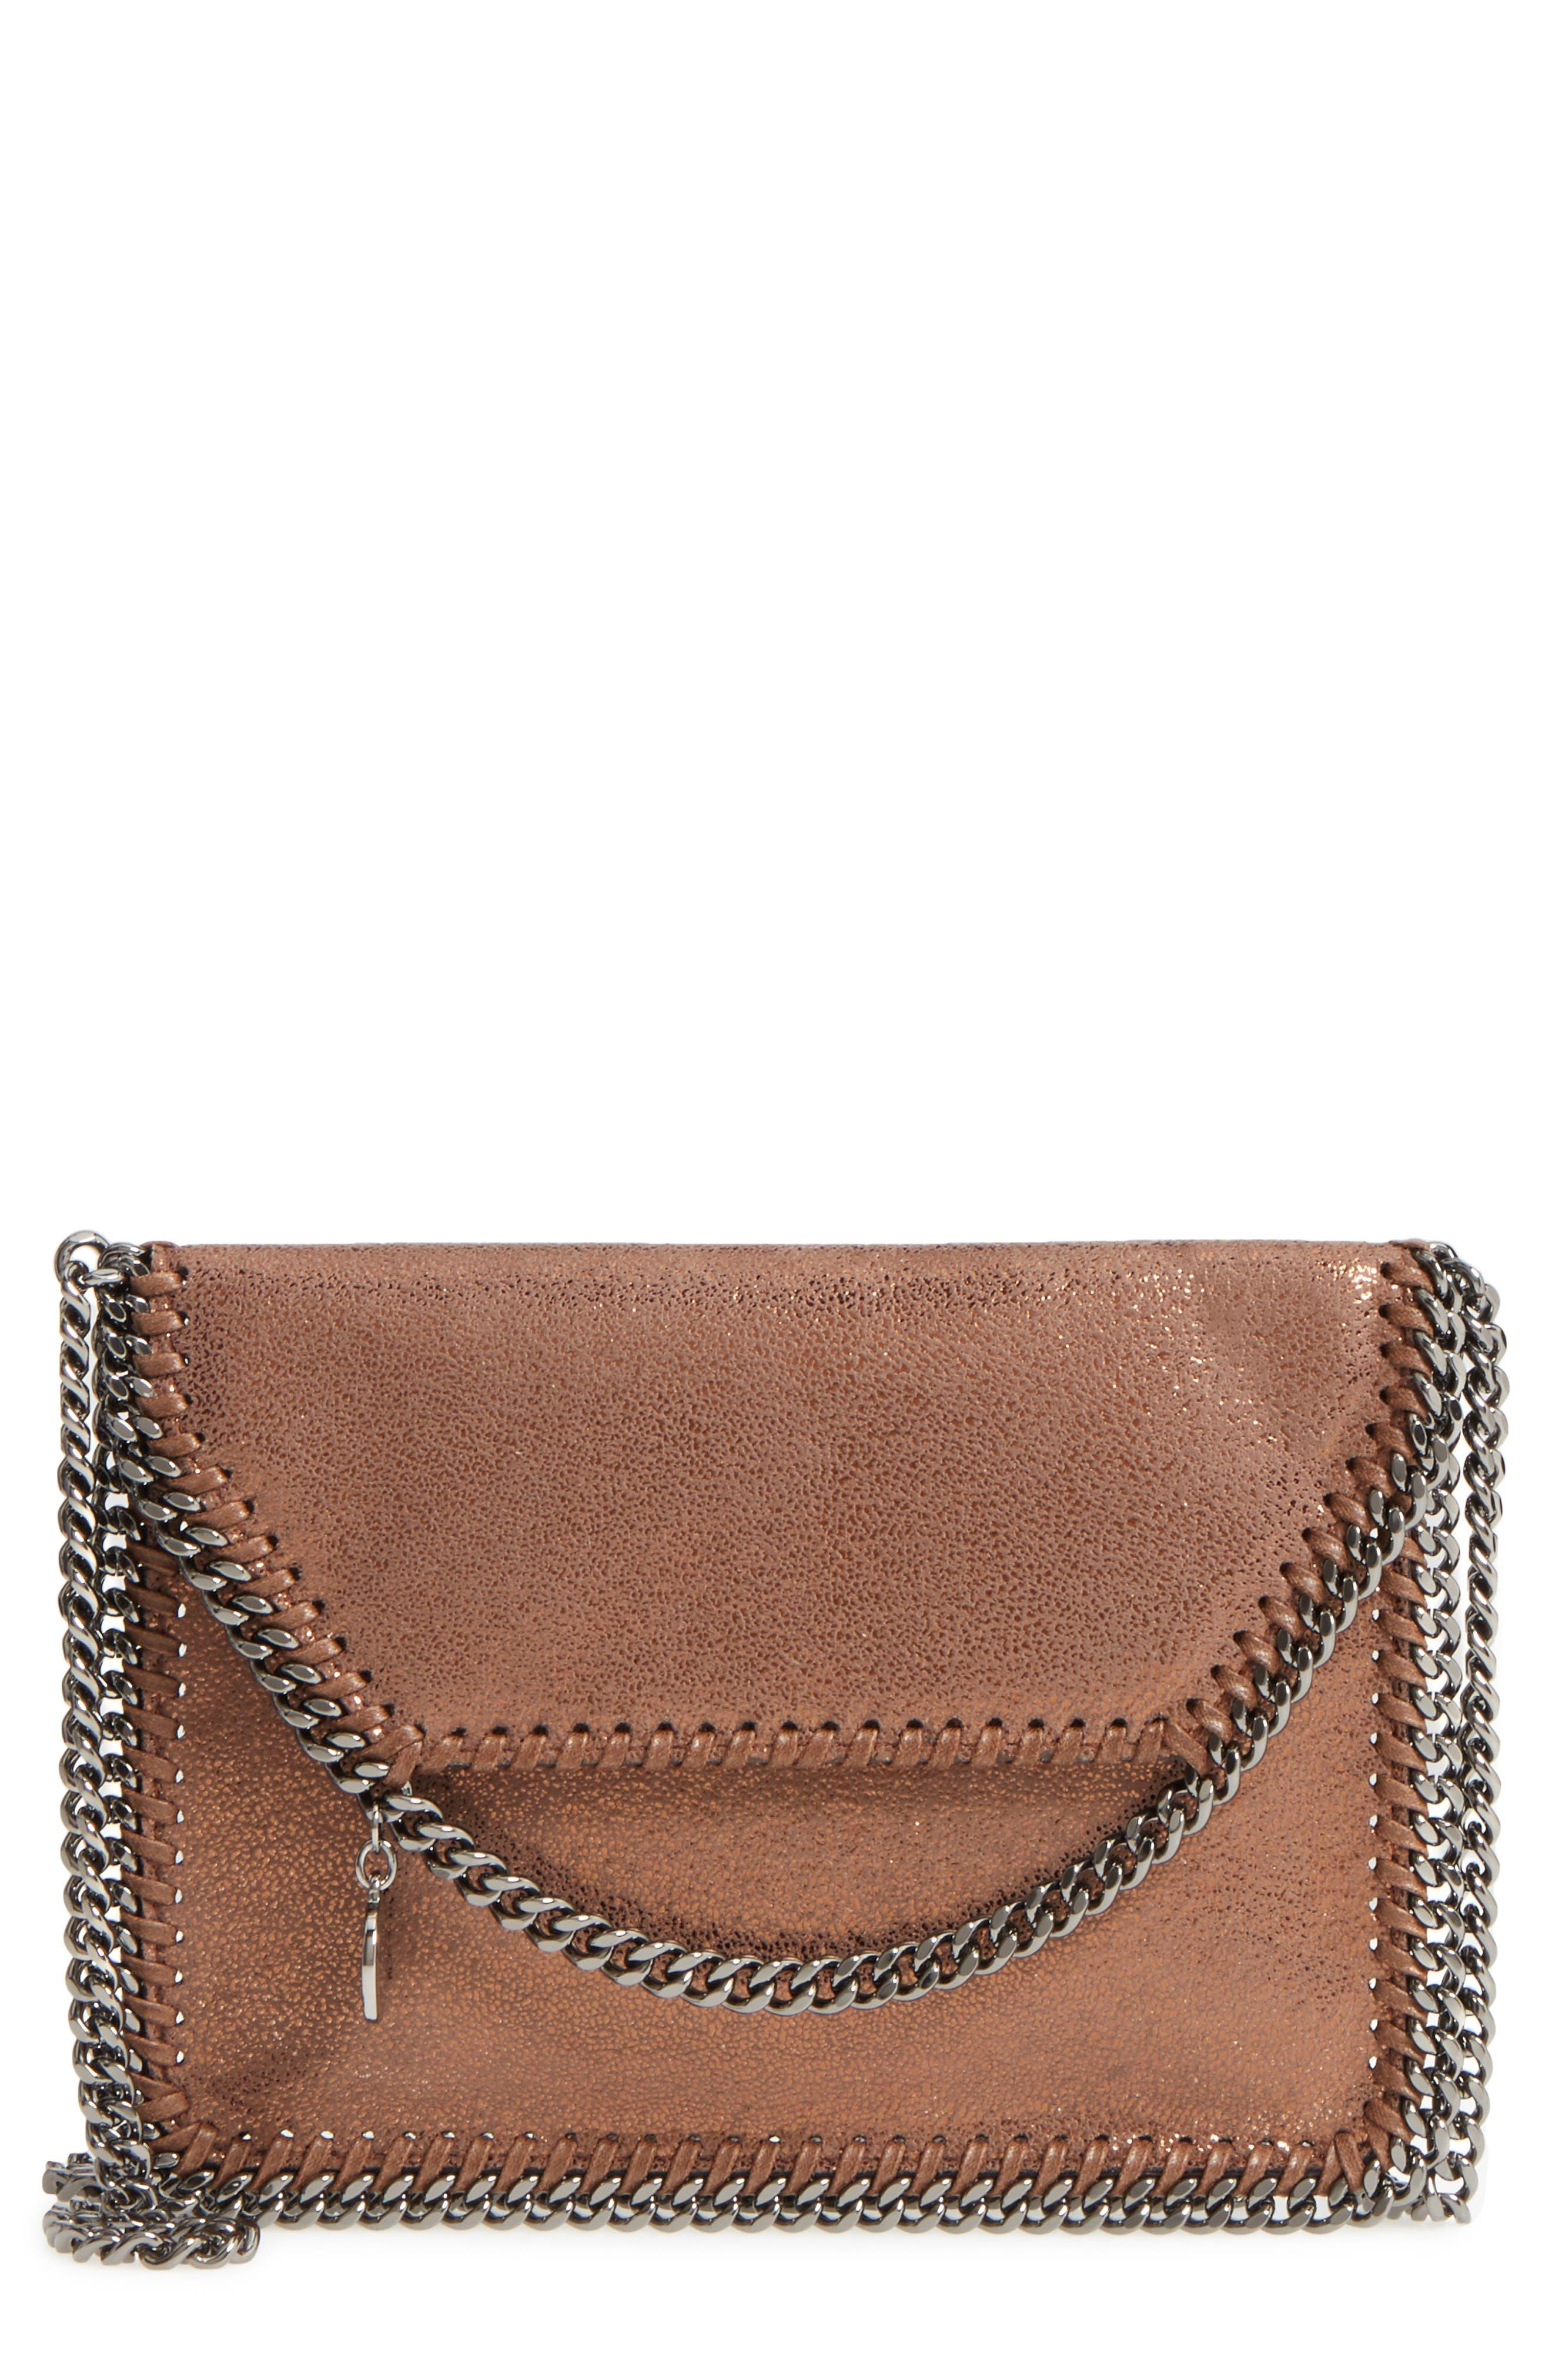 Metallic Faux Leather Crossbody Bag,                             Main thumbnail 1, color,                             200